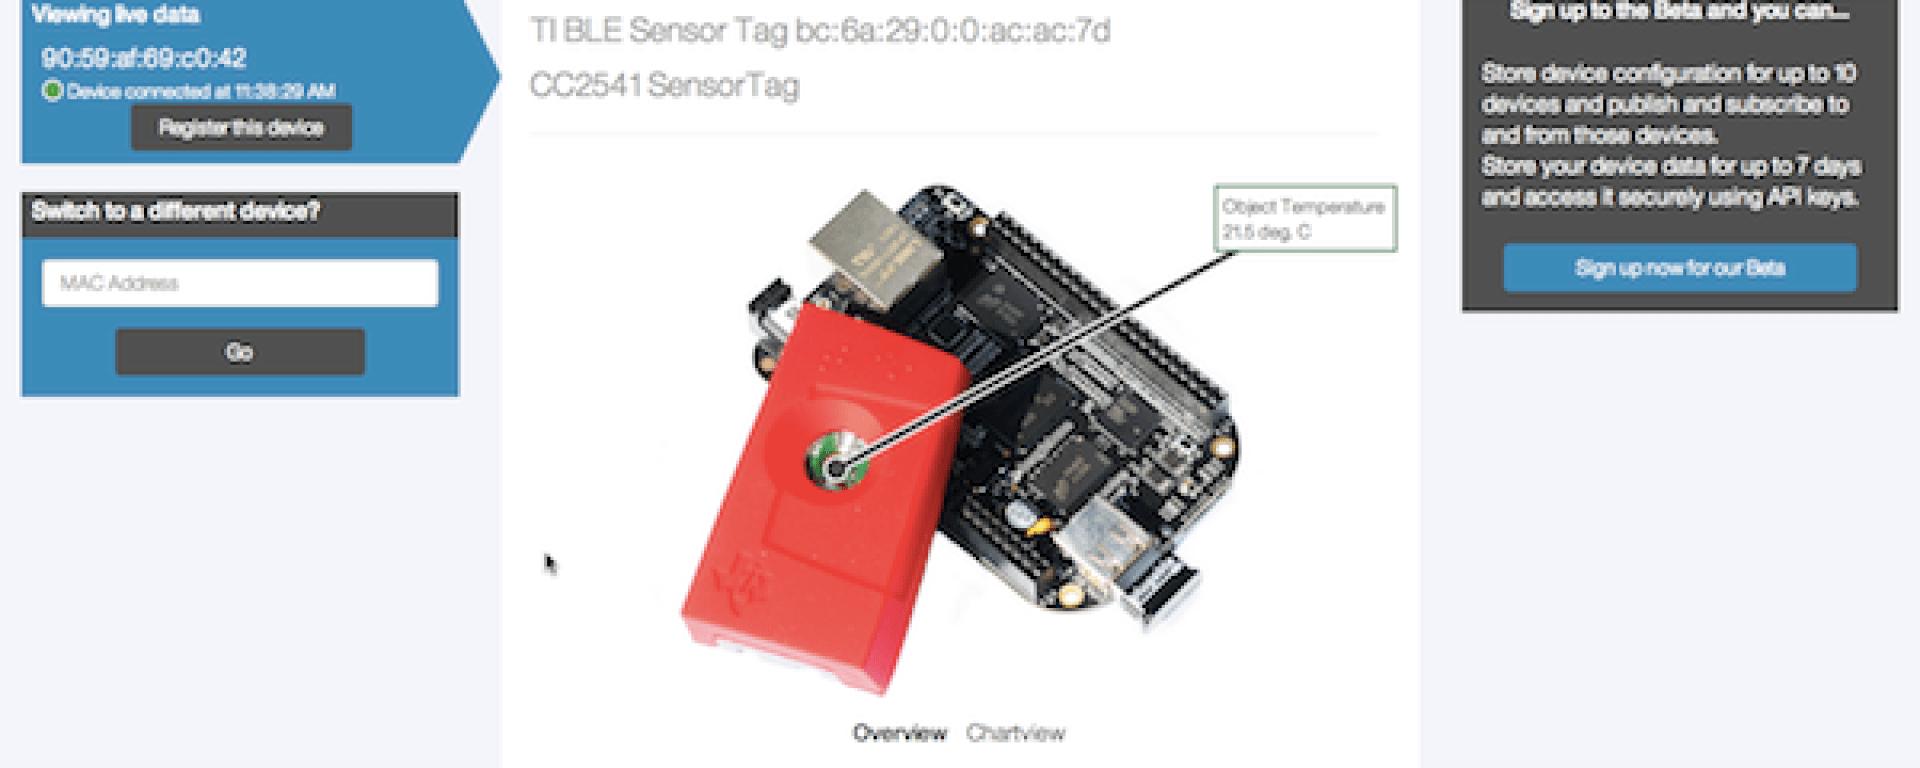 IBM tutorial on using TI SensorTag with BeagleBone Black